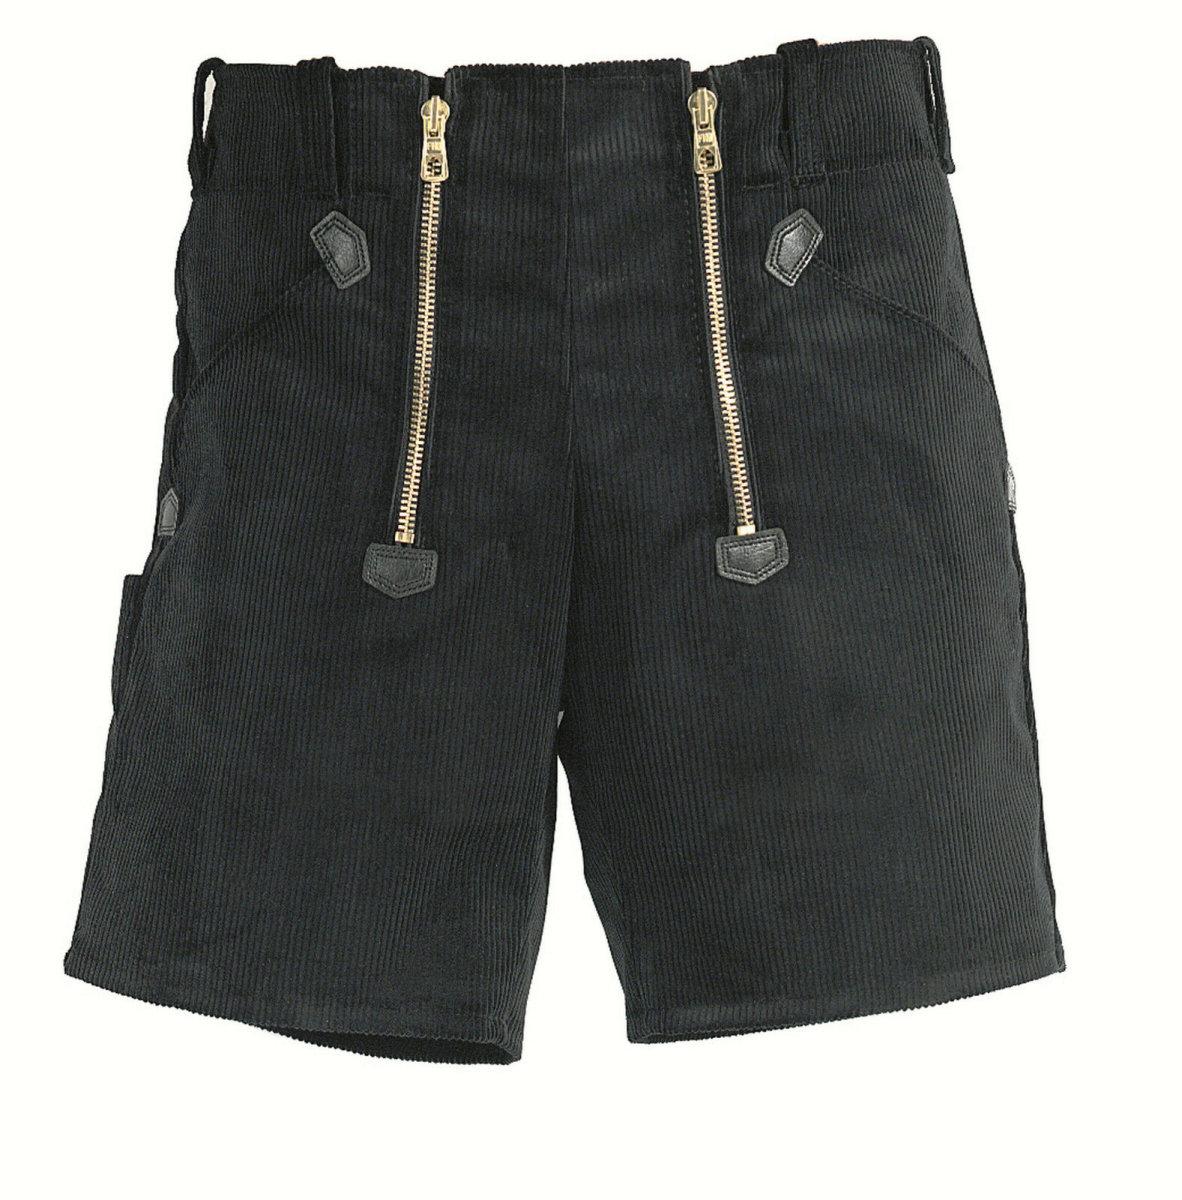 FHB Zunft-Shorts 20033 HANS Genuacord Feincord Zunfthose Sommerhose schwarz 054